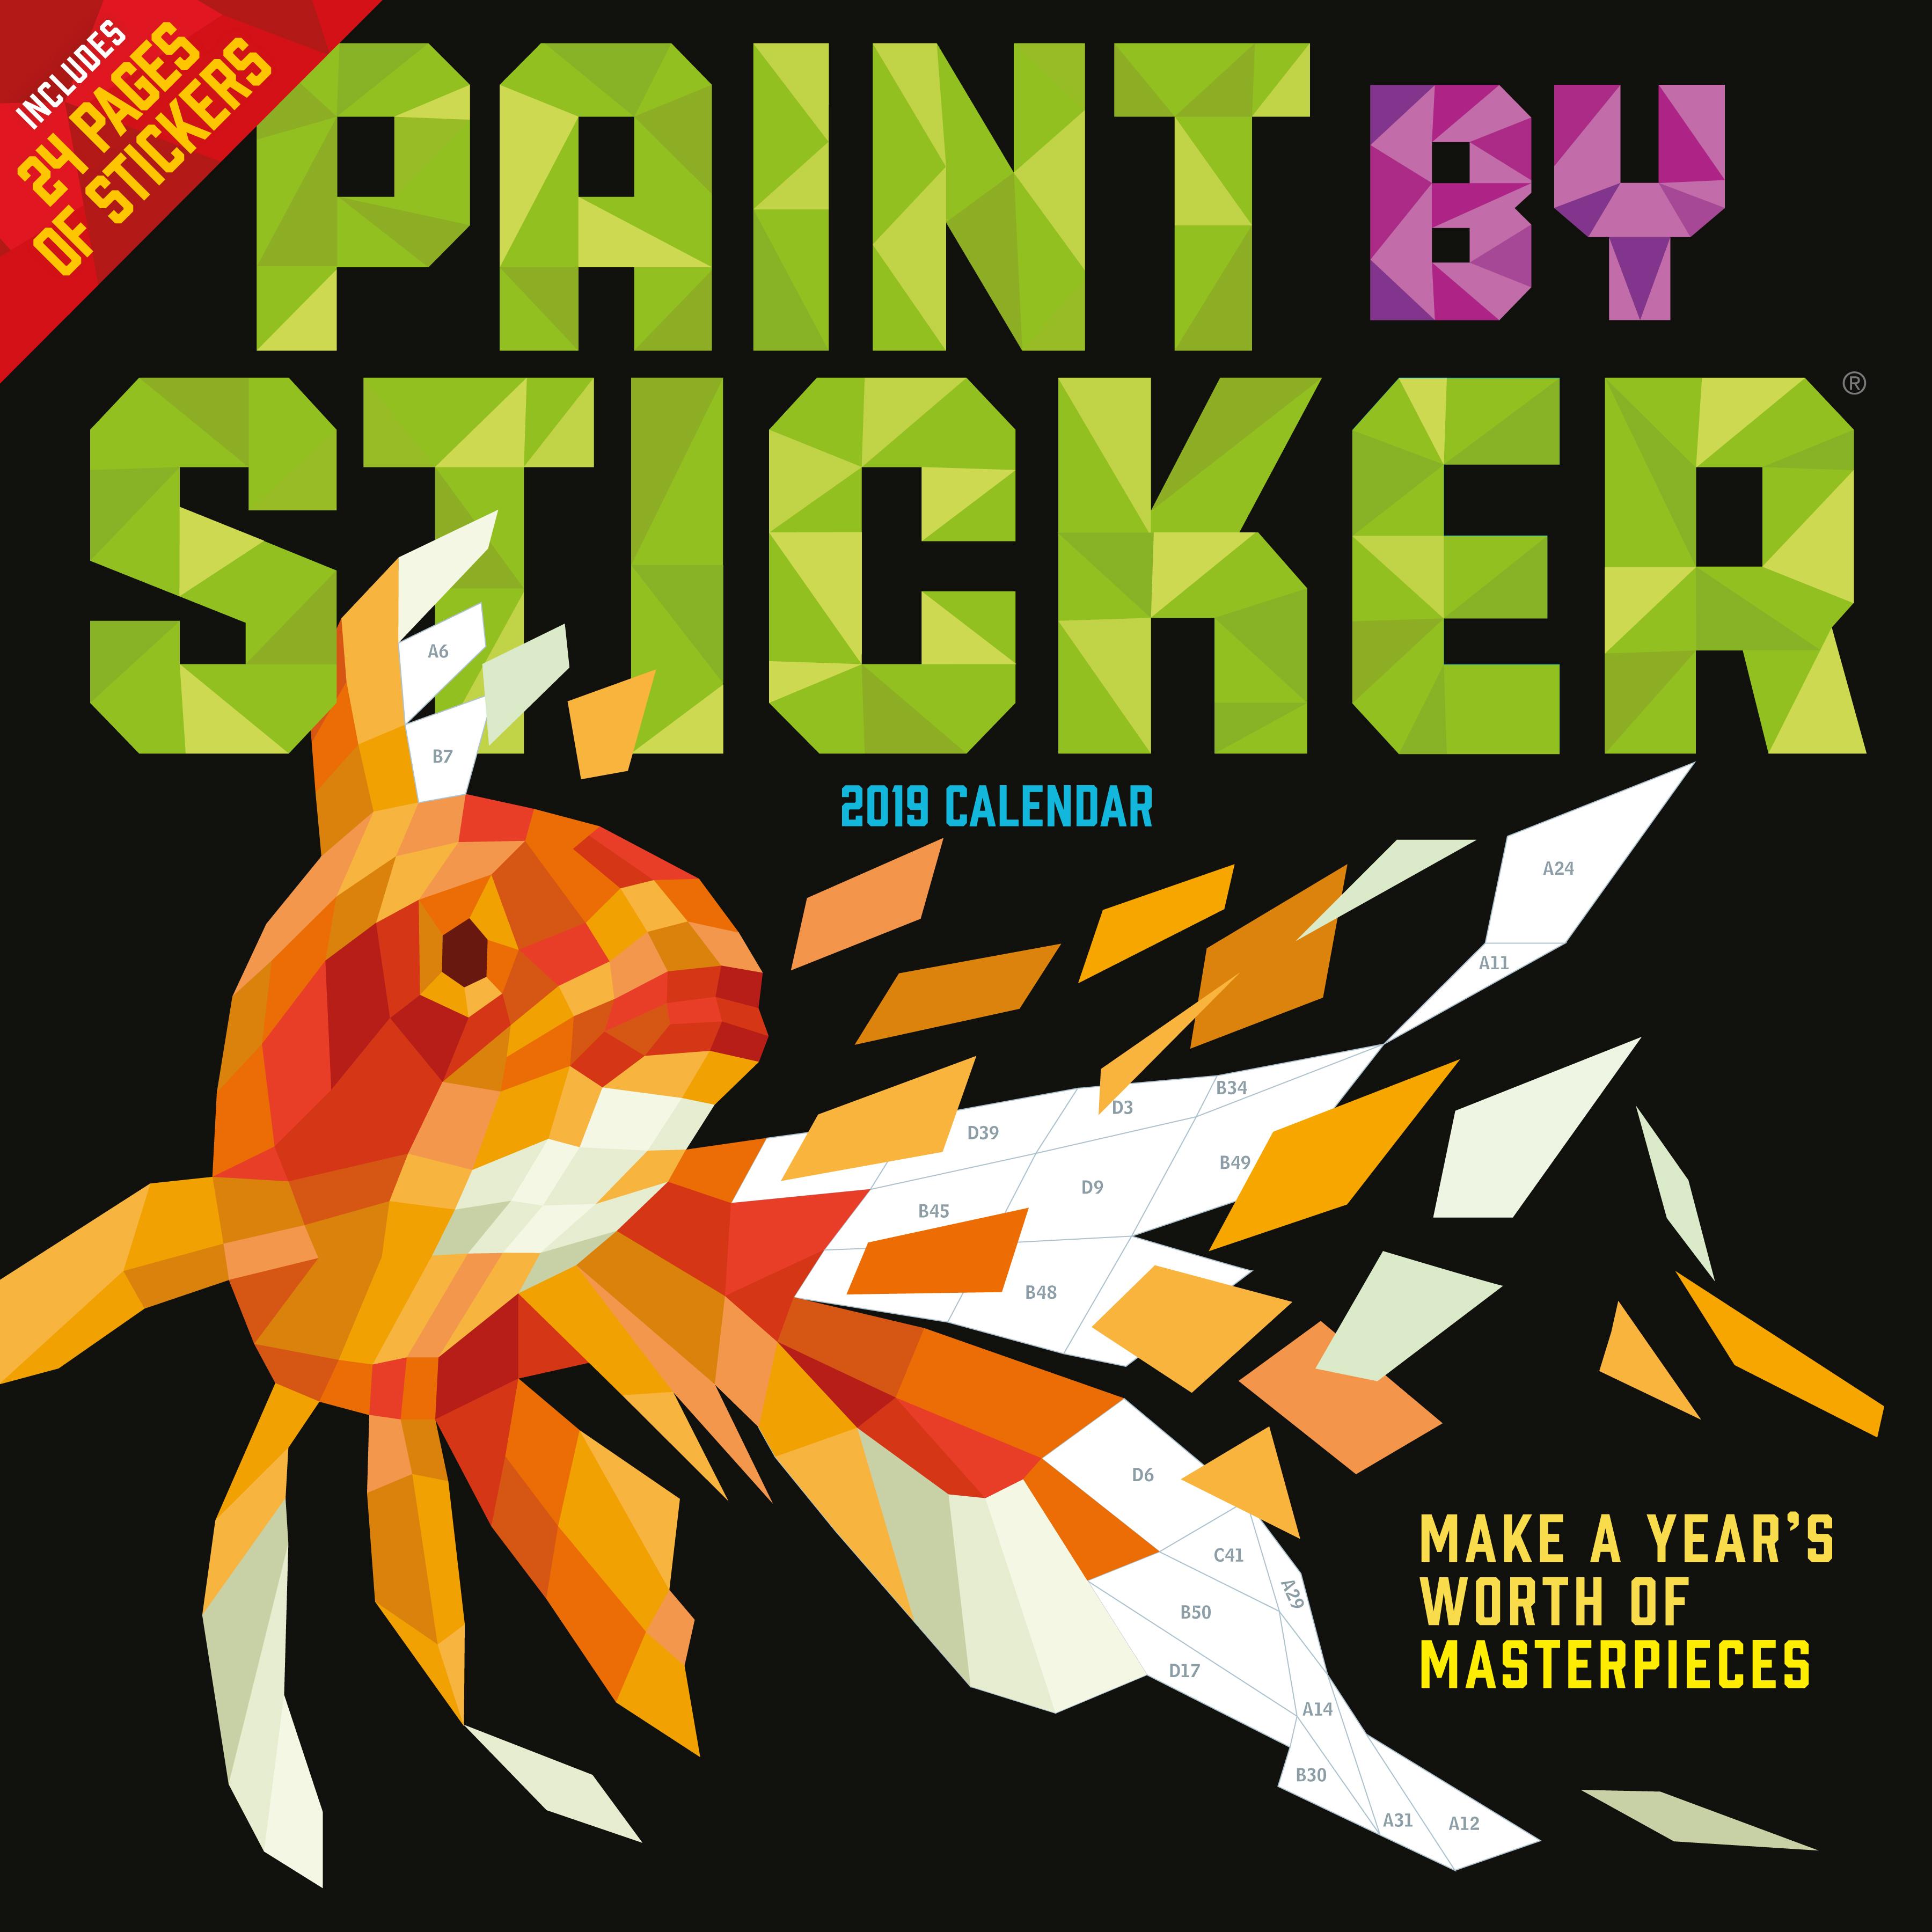 Kids Calendar With Activity Stickers : Paint by sticker wall calendar